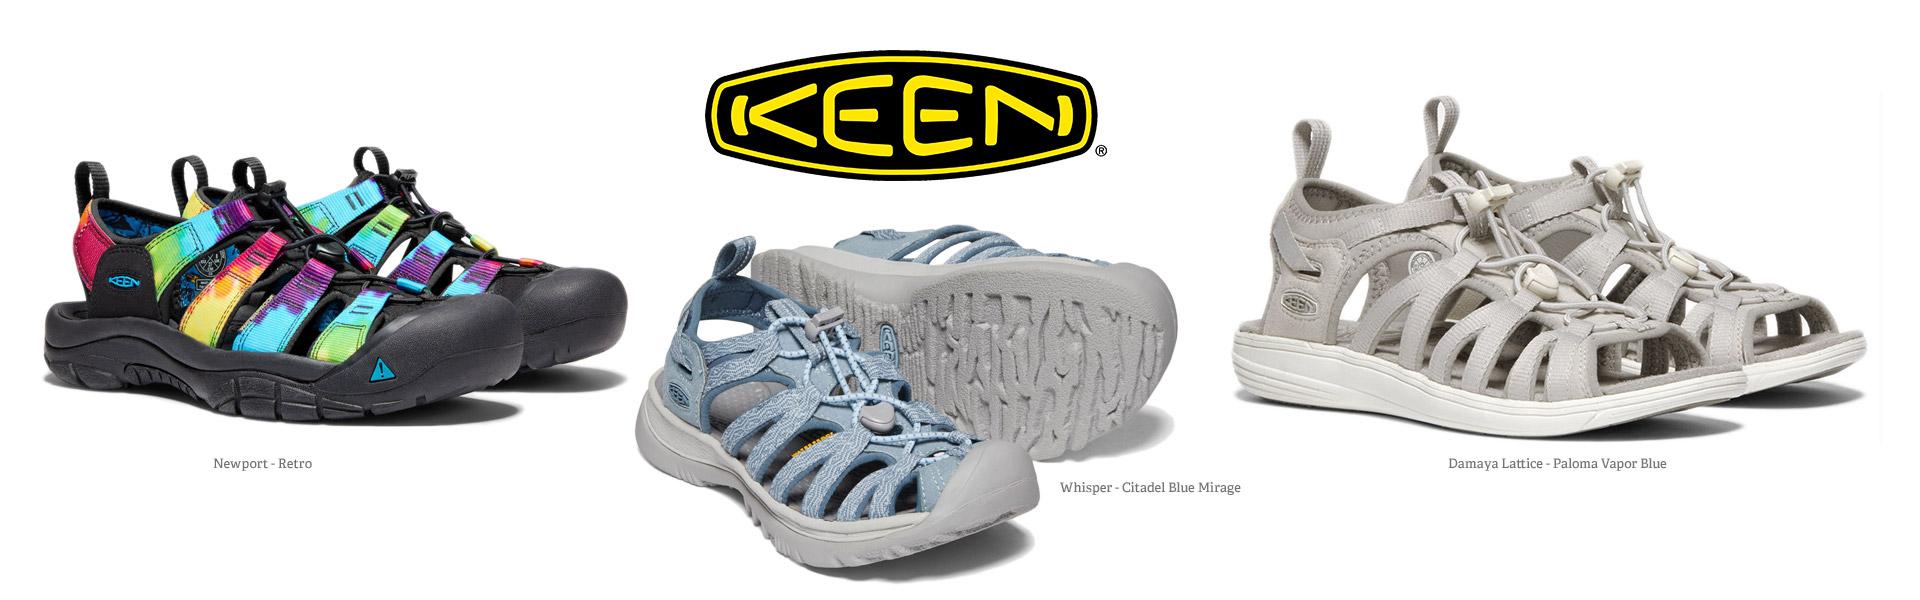 d49656370e54ae Coastal Shoes - Birkenstock Shoe Store - Lincoln City